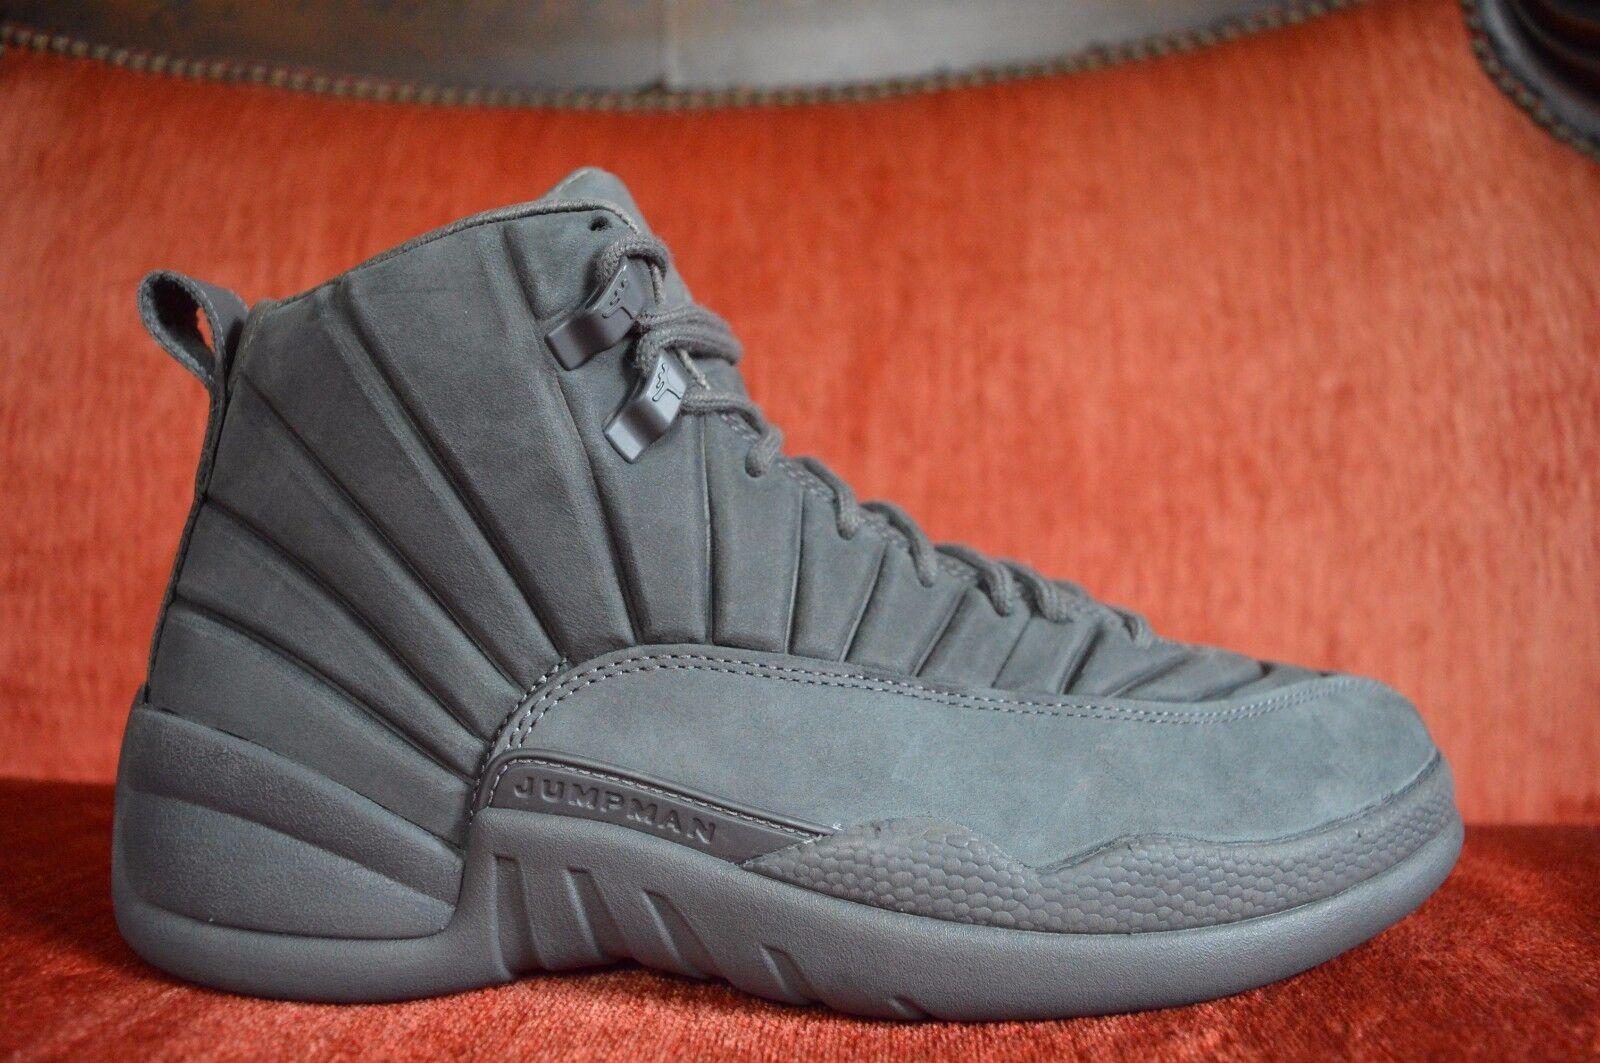 WORN 1X Nike Jordan Retro School XII 12 PSNY Public School Retro New York Size 9 130690-003 0ab2dd